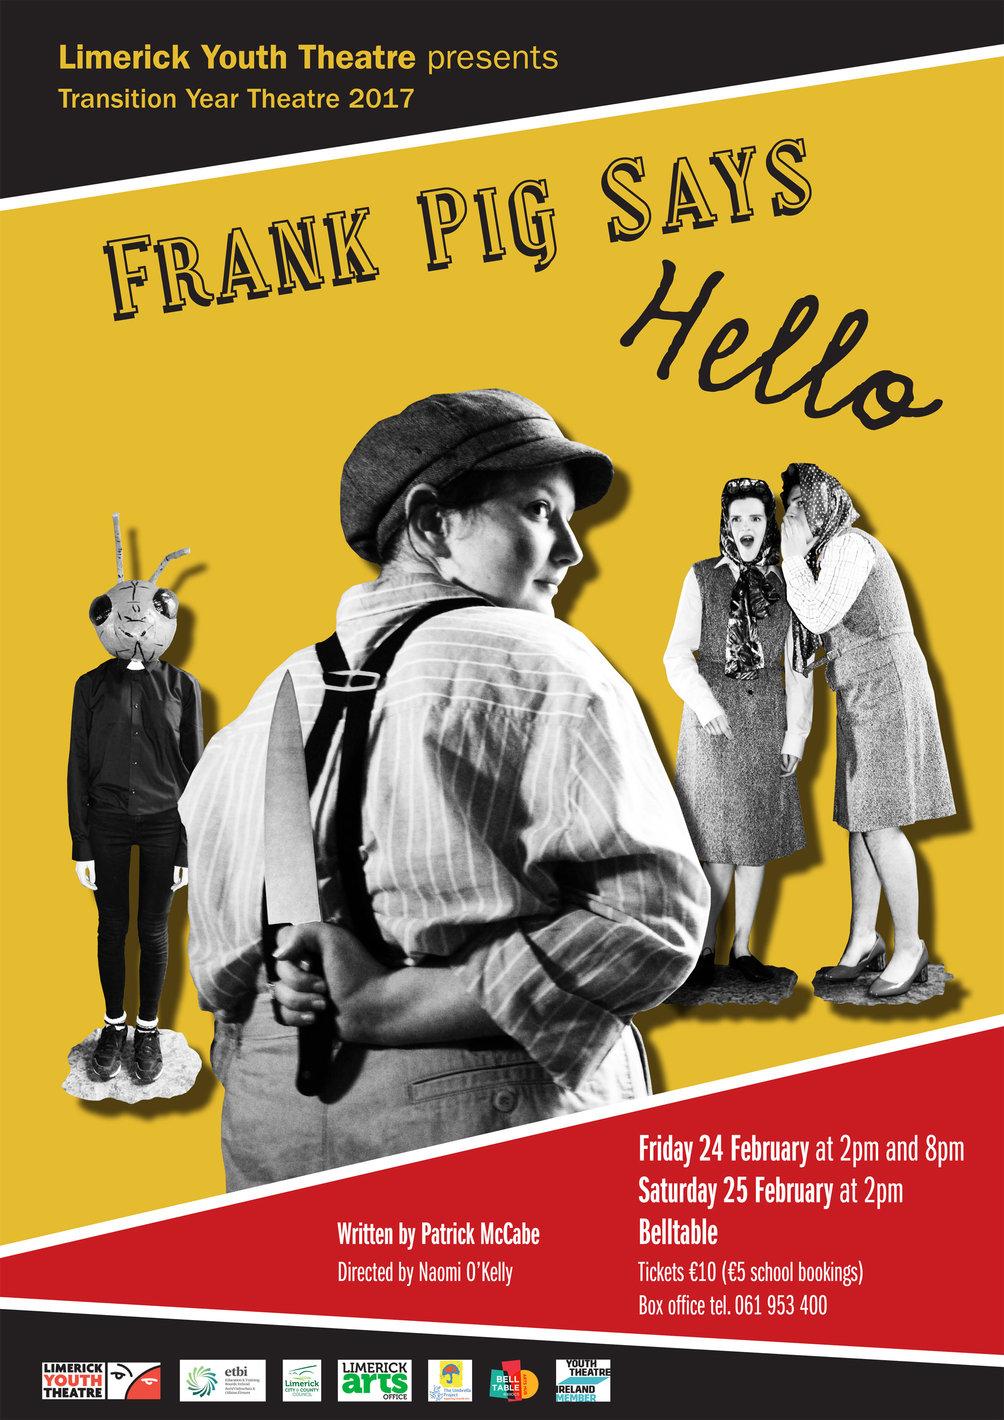 Frank Pig Says Hello